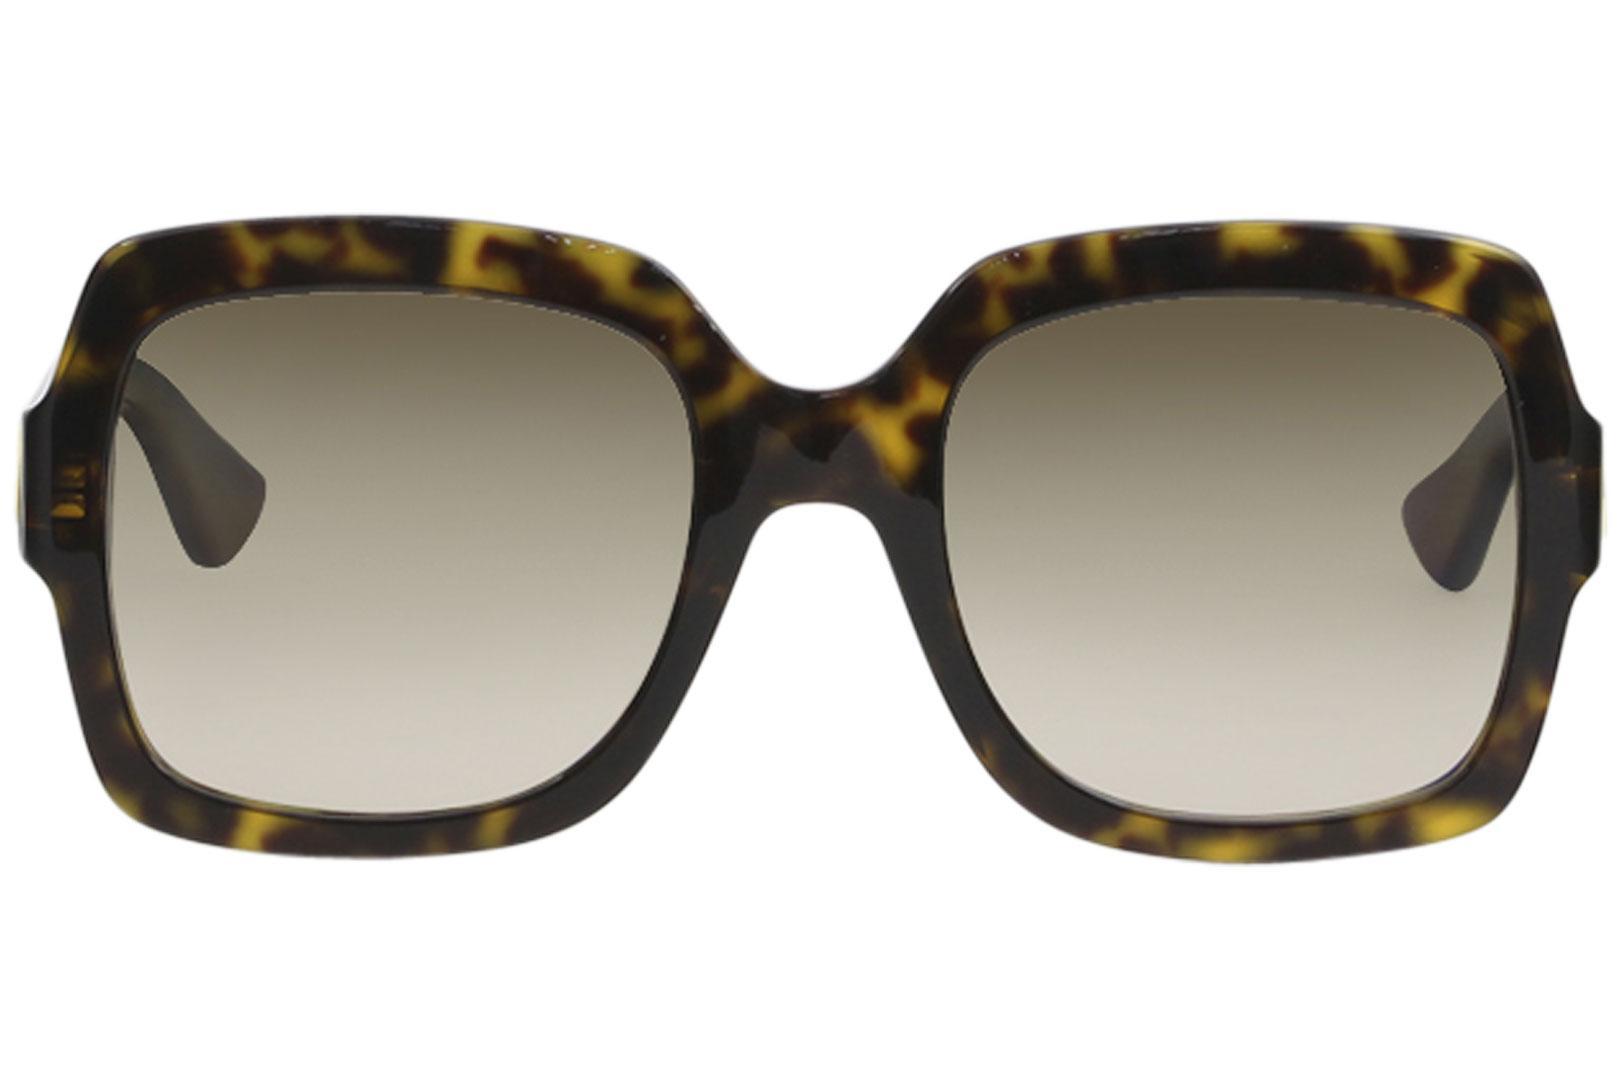 7c3e3e7f3e5e4 Gucci Women s GG0036S GG 0036 S Fashion Sunglasses